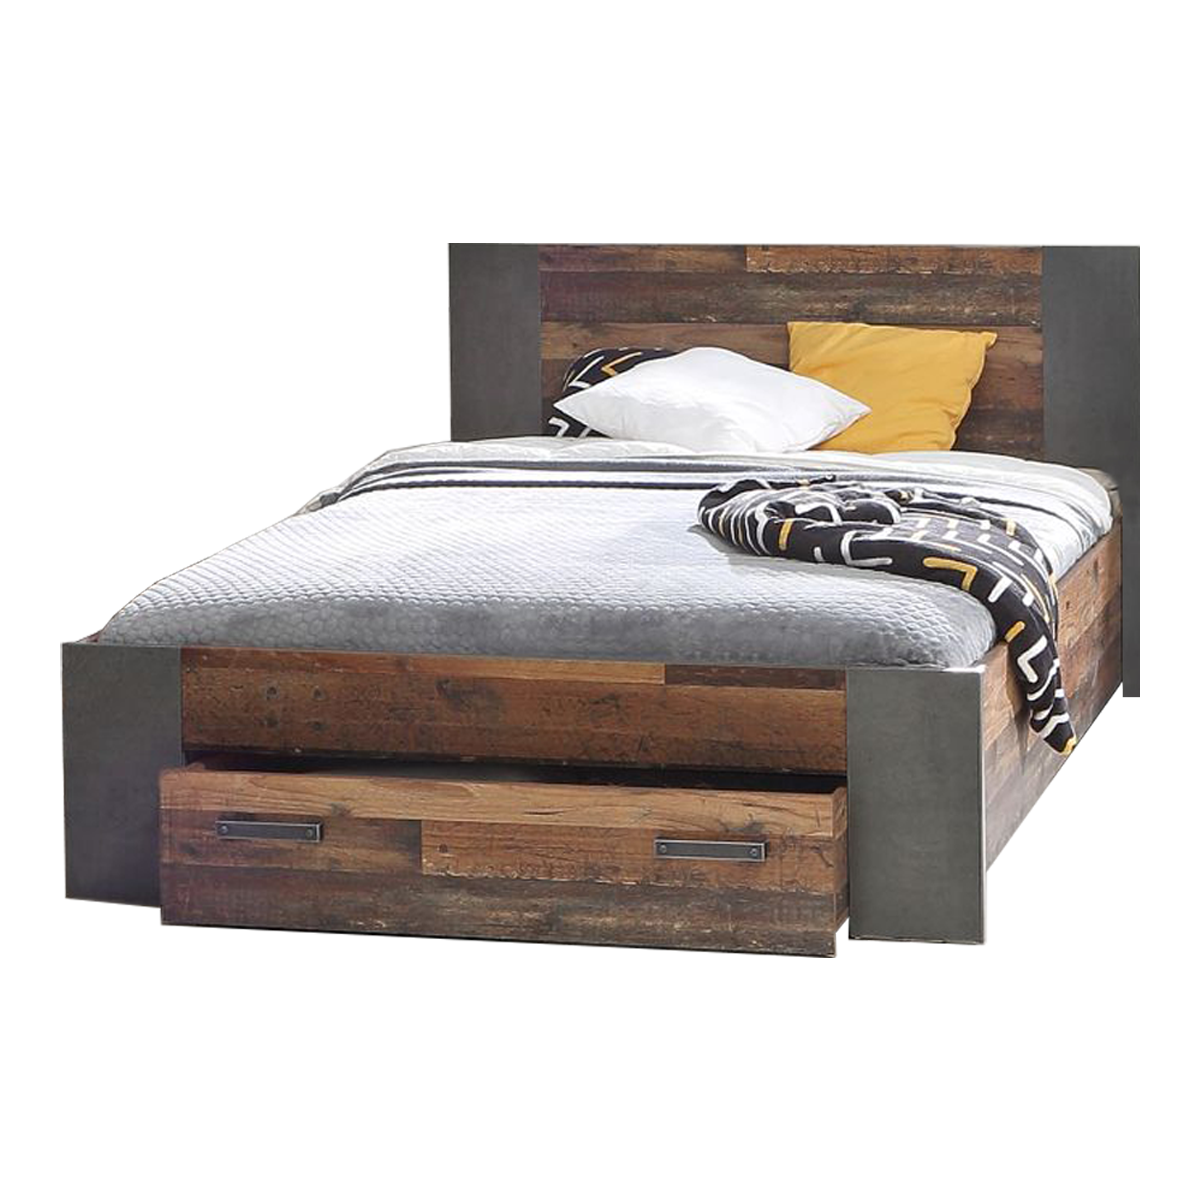 Full Size of Bett Mit Unterbett 5b930ff18147d 200x200 Bettkasten Küche Elektrogeräten 120 X 200 Massivholz 140x220 Balinesische Betten 80x200 Amerikanisches Schubladen Bett Bett Mit Unterbett